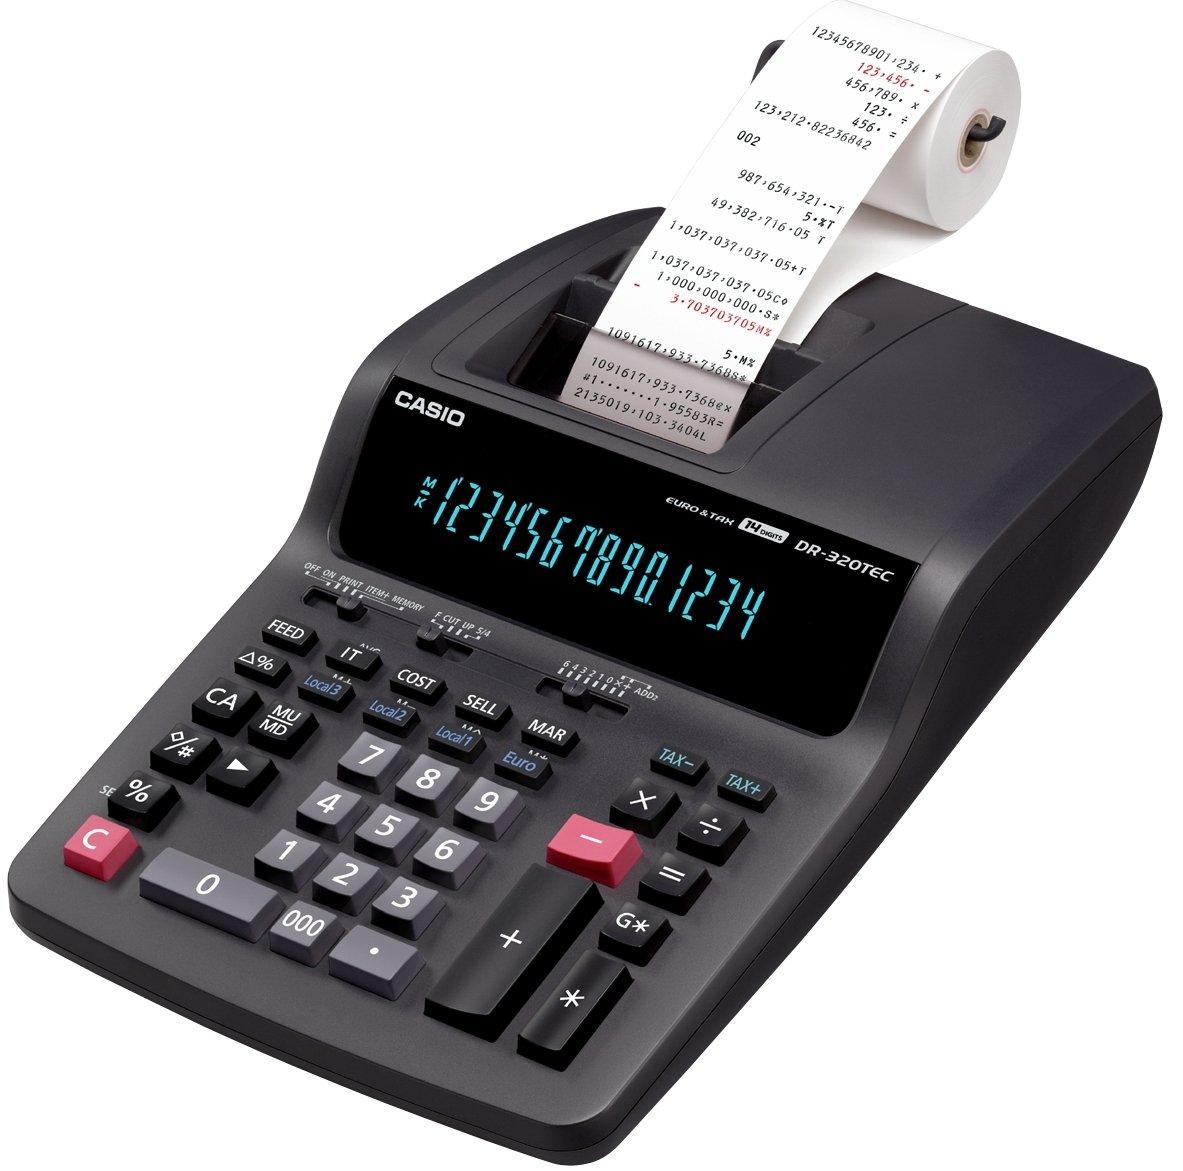 Casio Dr 320tec Heavy Duty Printing Calculator Office Colorful Sl 310uc Orange Products